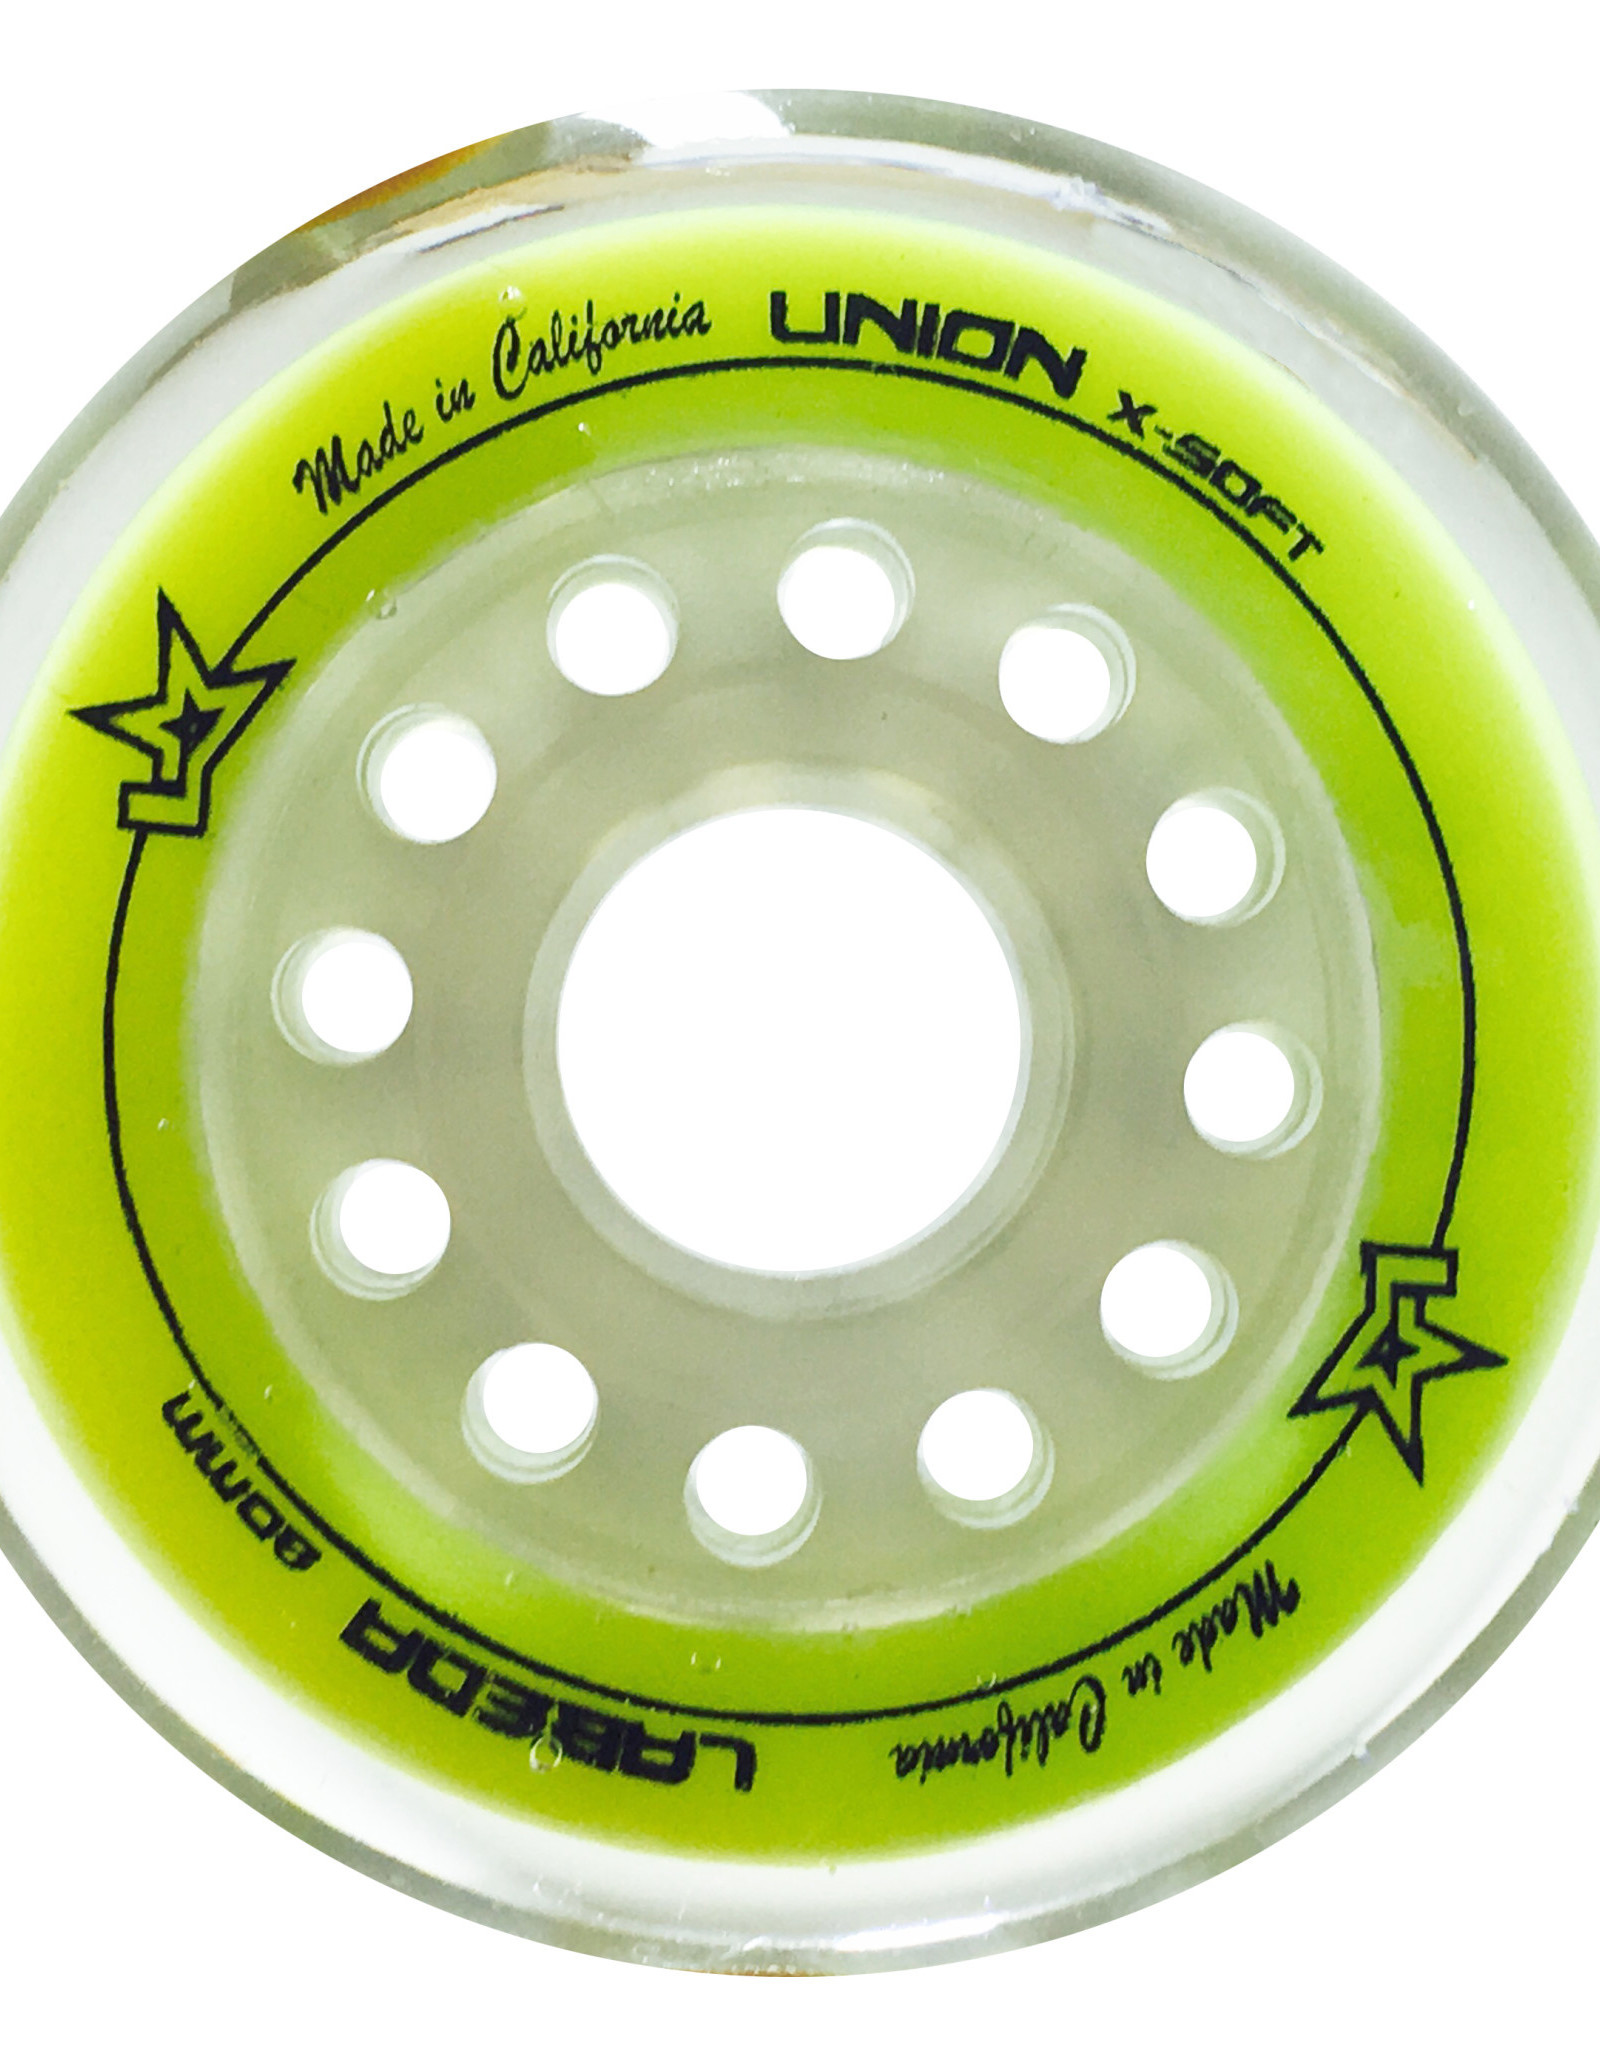 Labeda Labeda Union Inline Wheels (Yellow) X-Soft